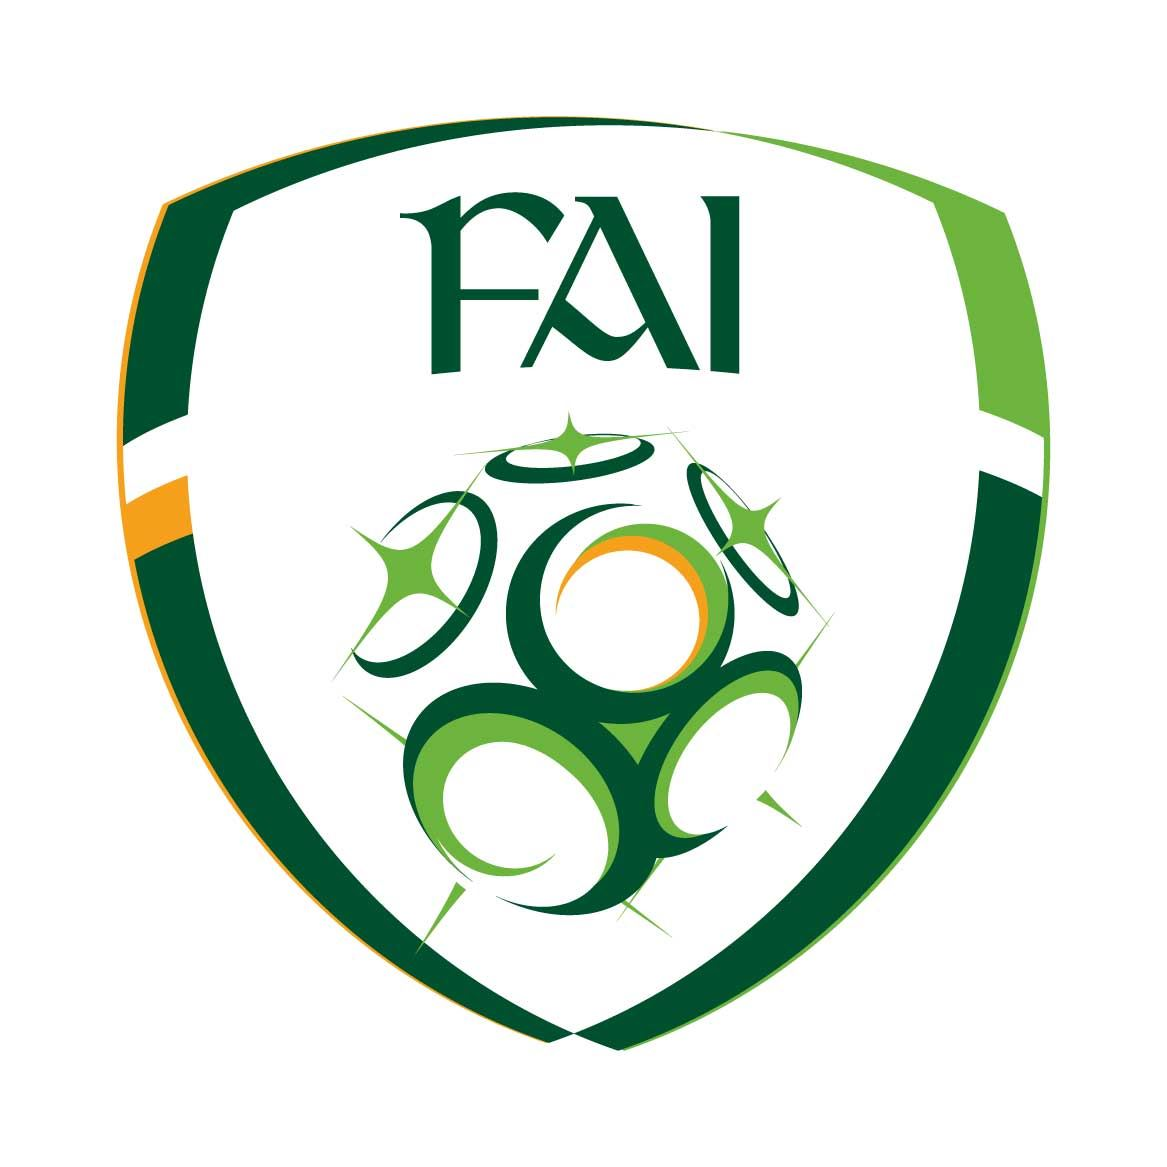 FAI Coach Education- Do Not Change - Rob Sweeney